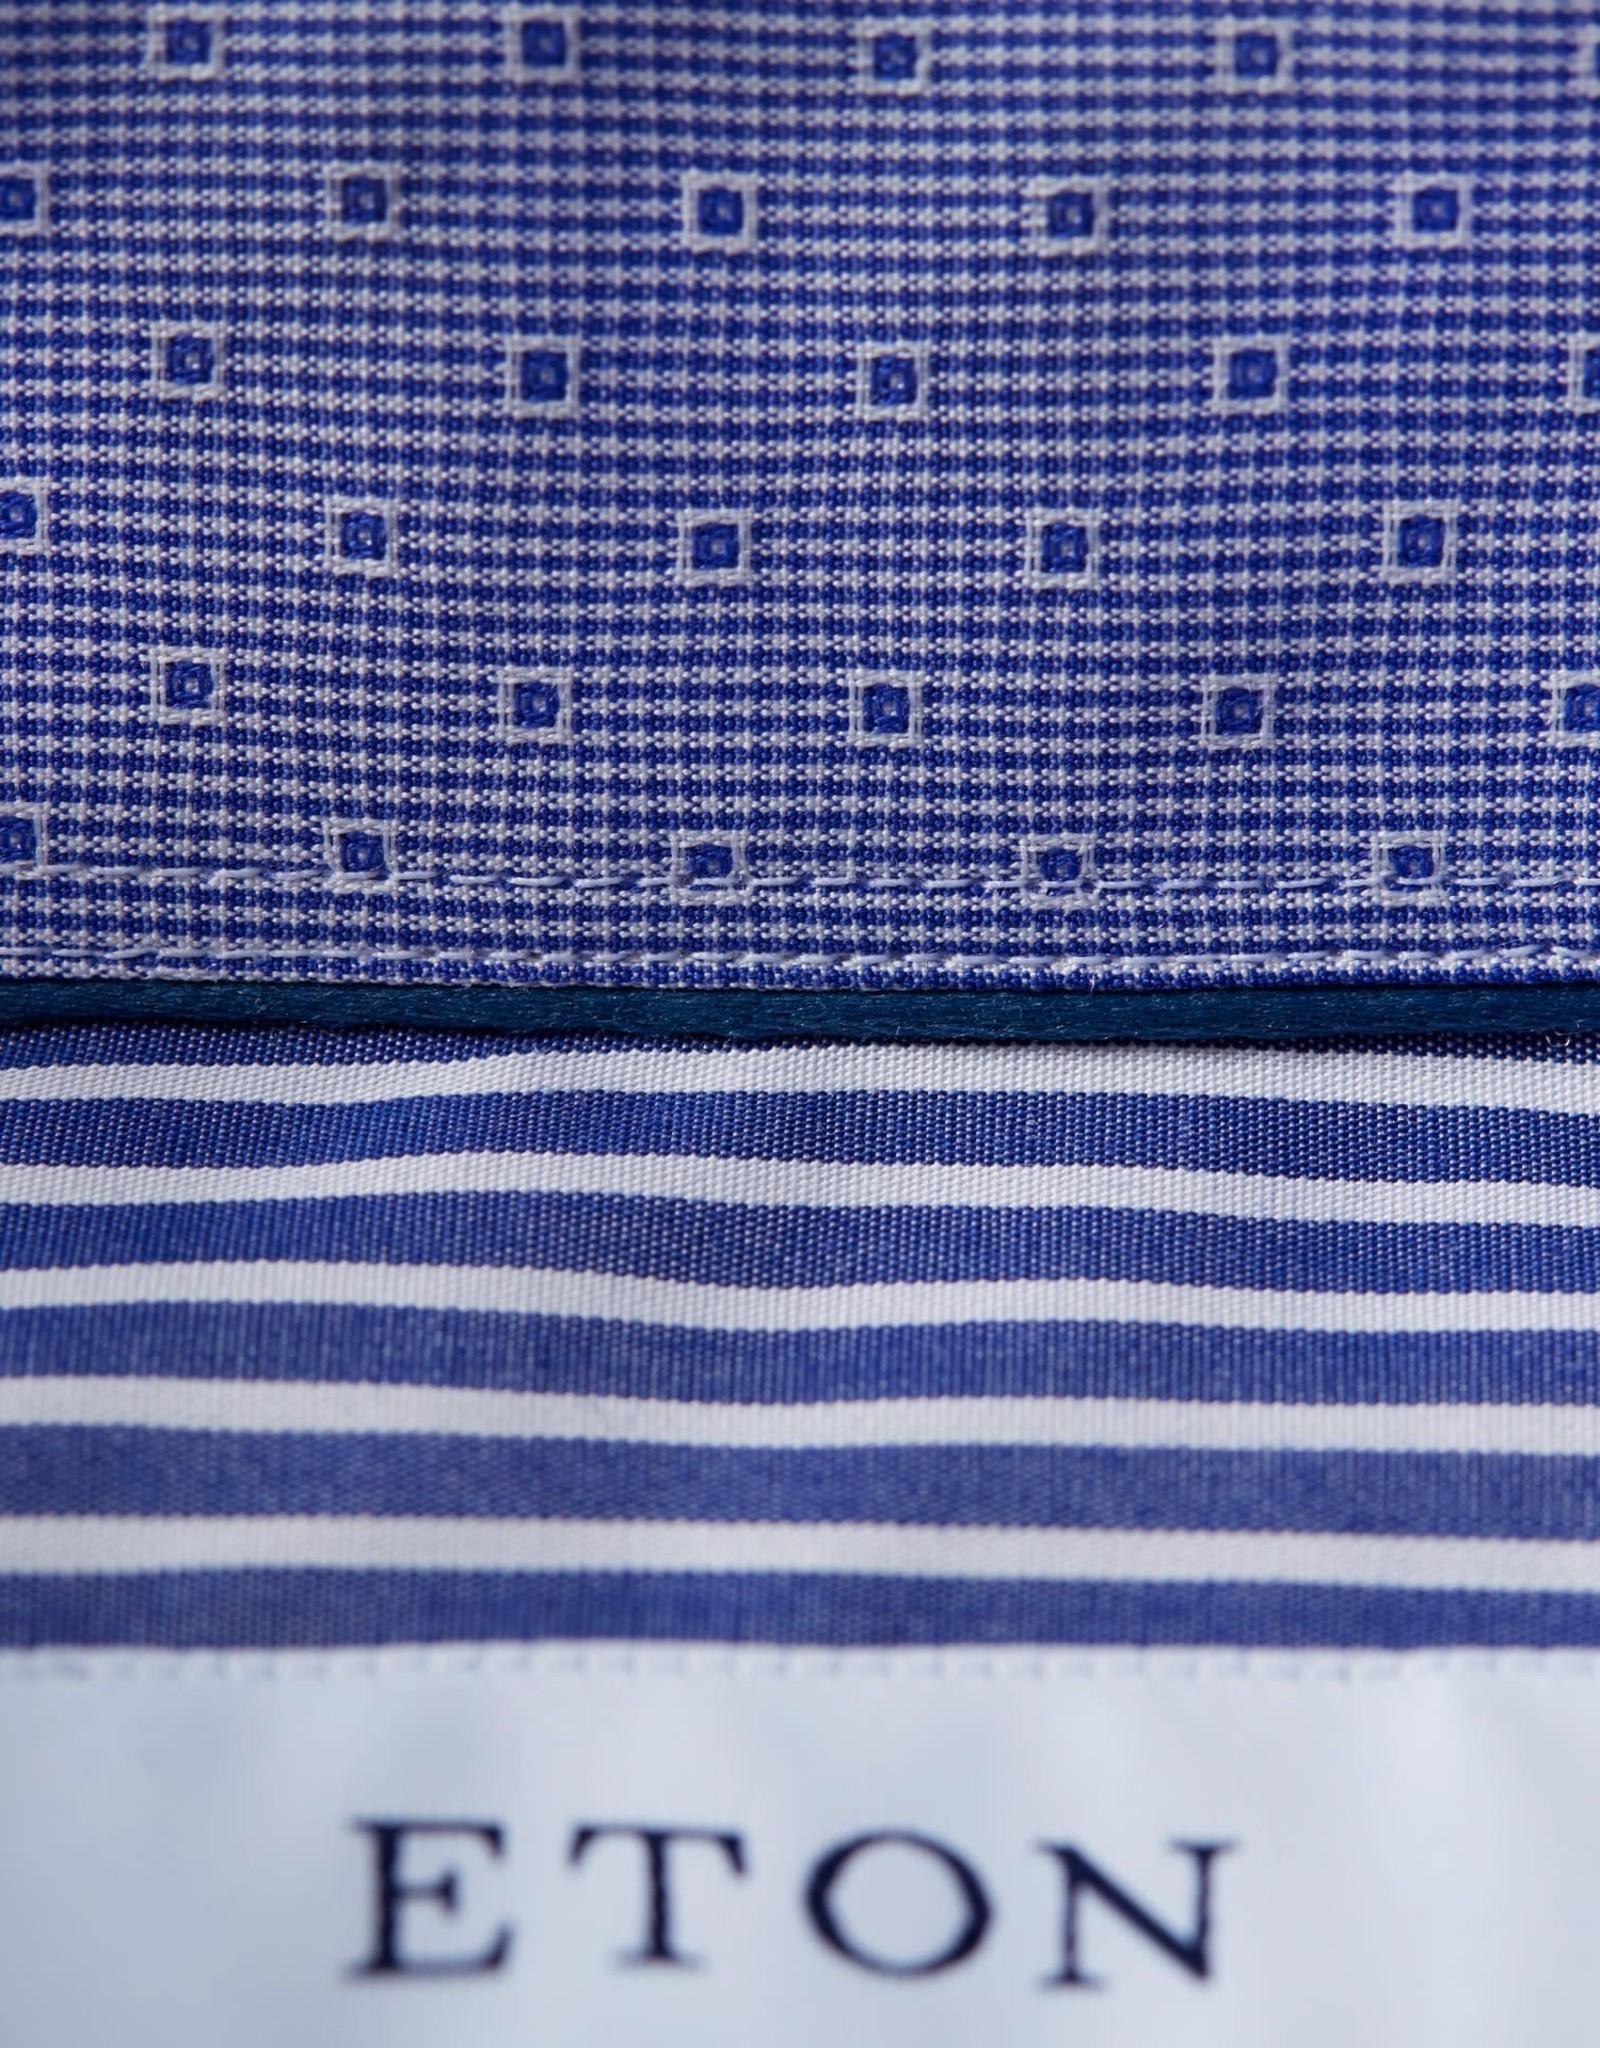 Eton Eton hemd blauw classic 2036-78167/25